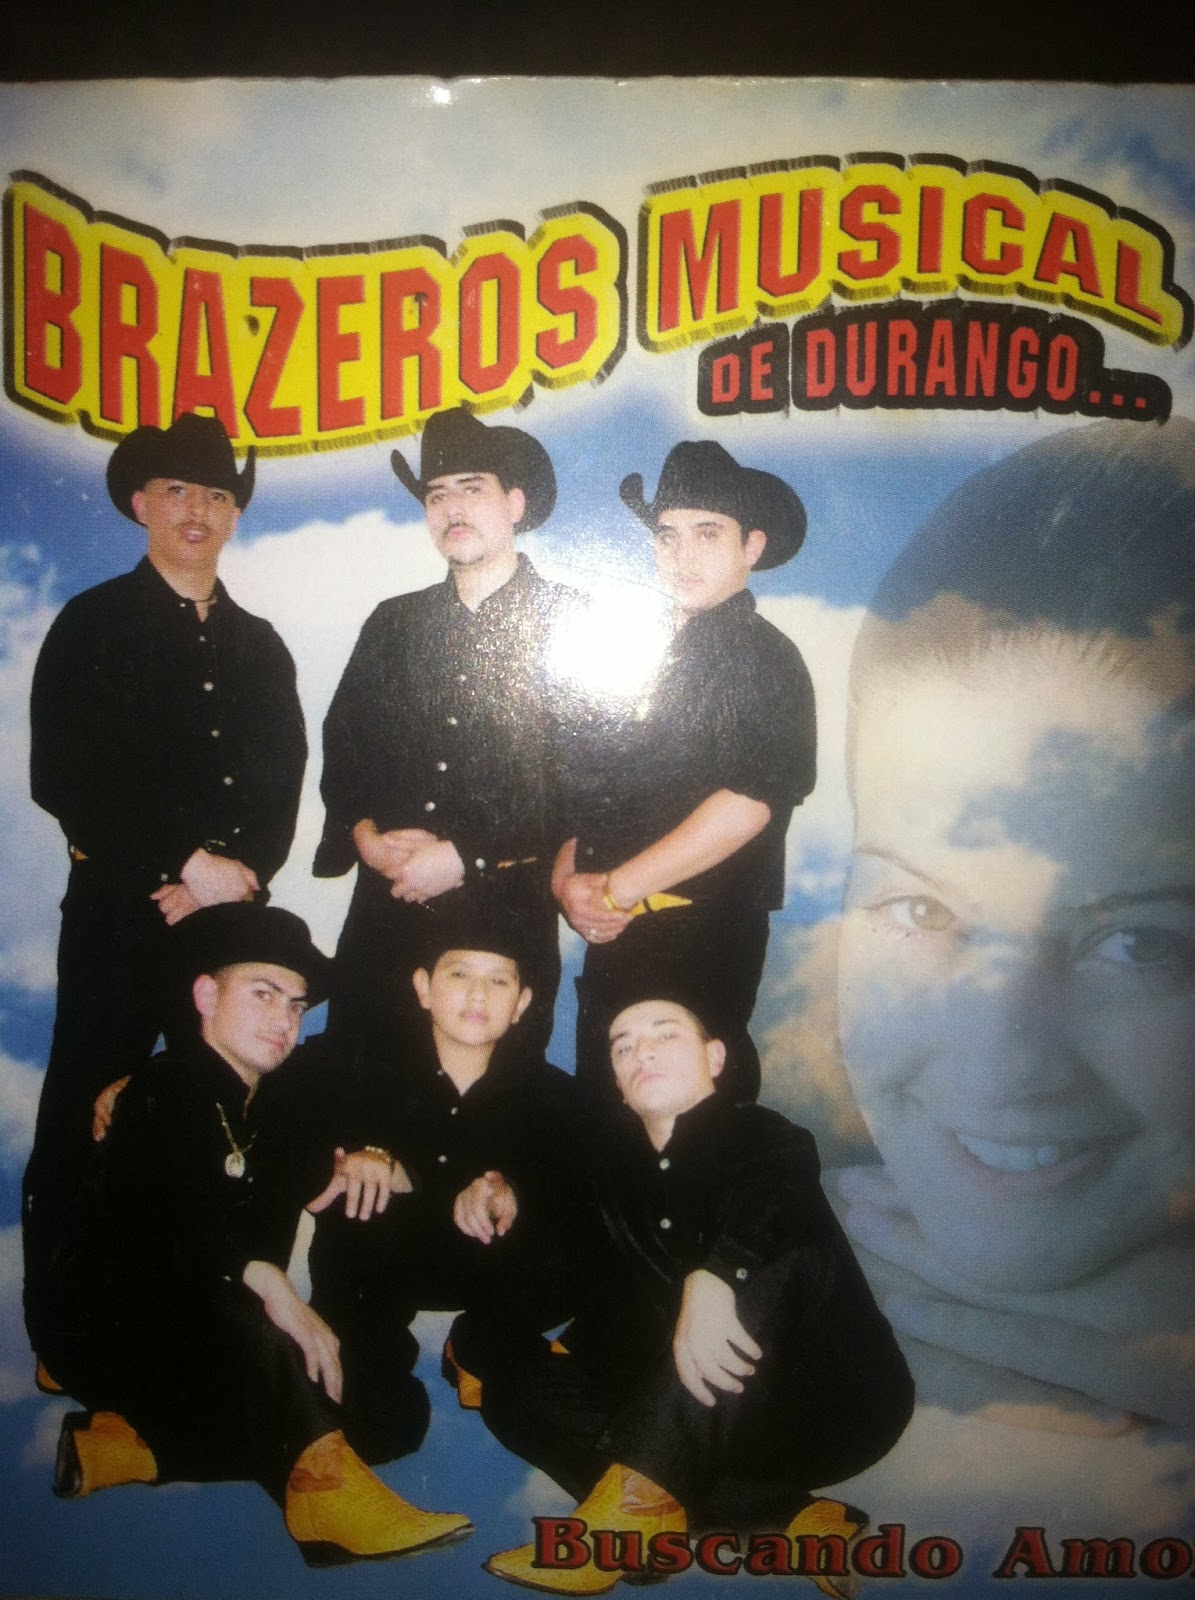 Puro San Miguel Allende Dgo Brazeros Musicalbuscando Amores